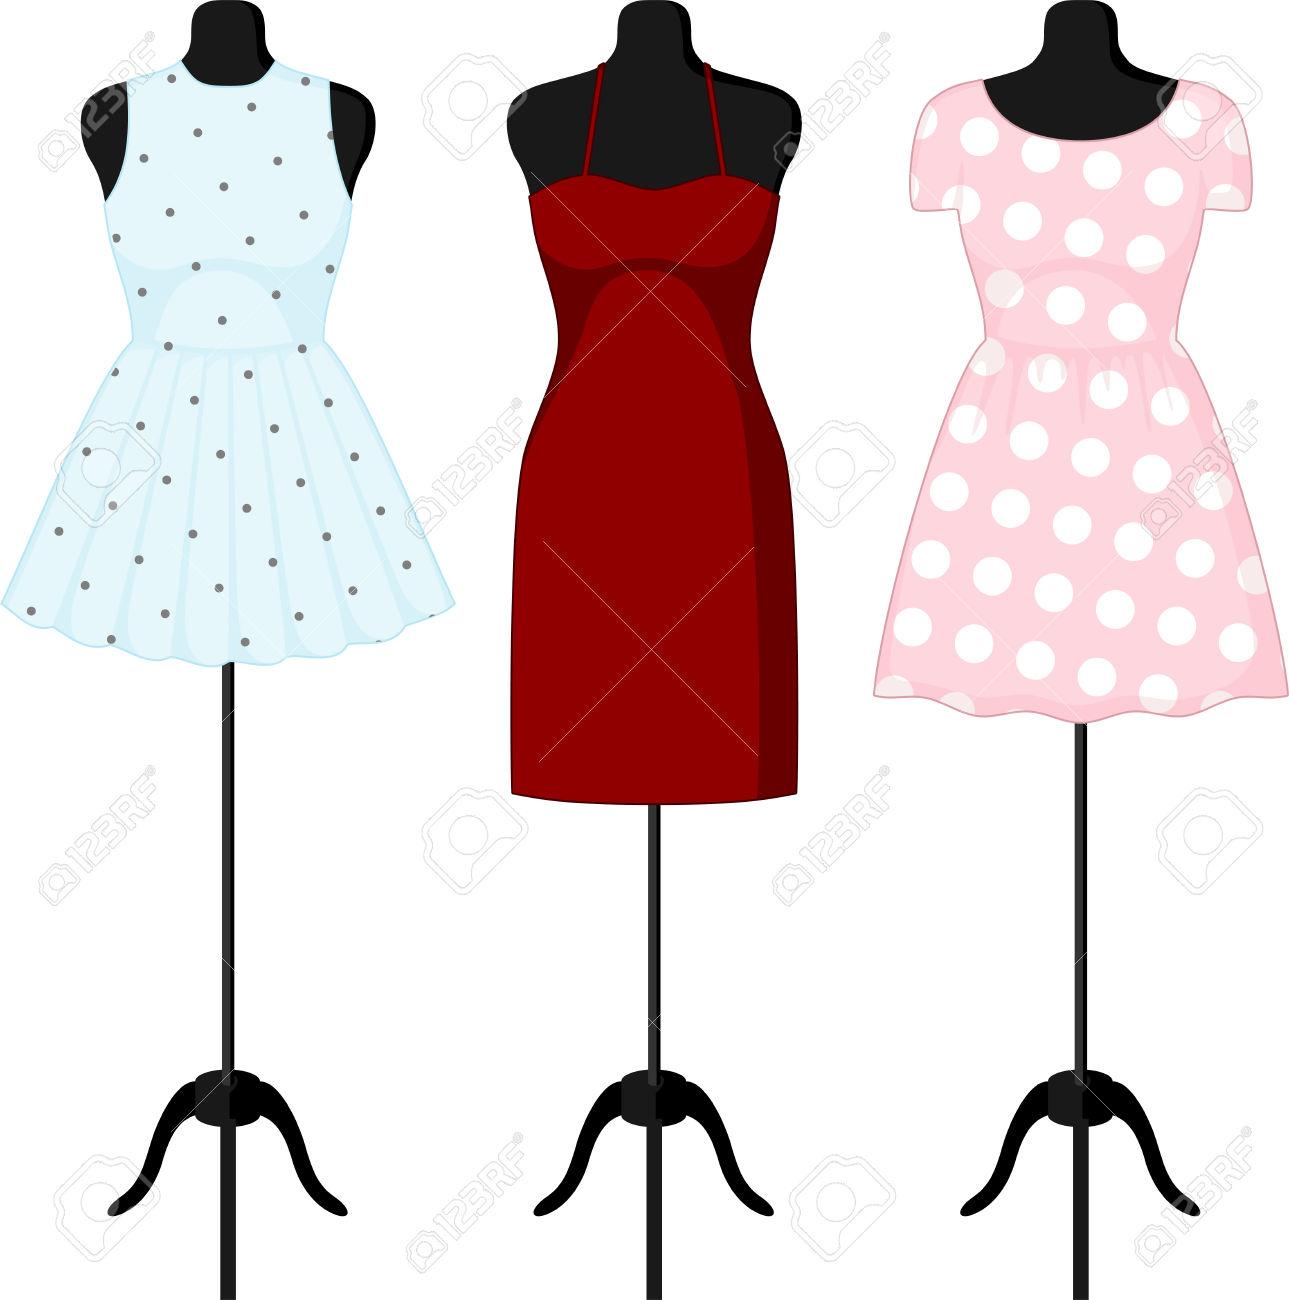 Gown clipart manikin Mannequin Mannequin 20clipart Clipart #107